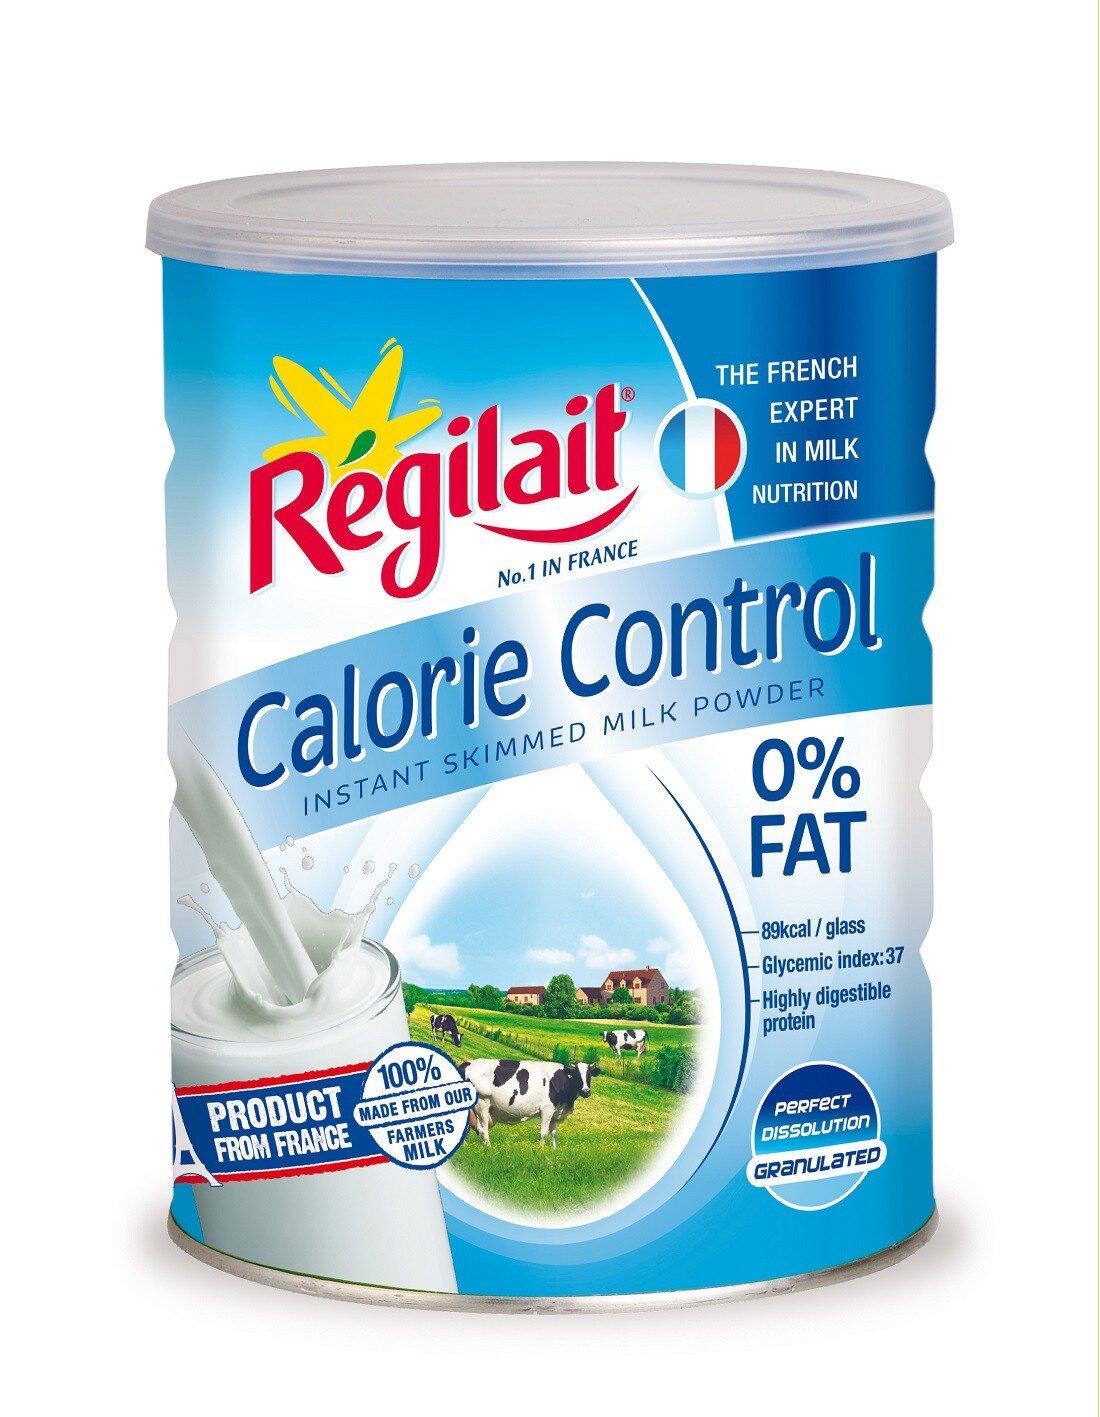 Sữa bột không béo Regilait Calorie Control - hộp 700g